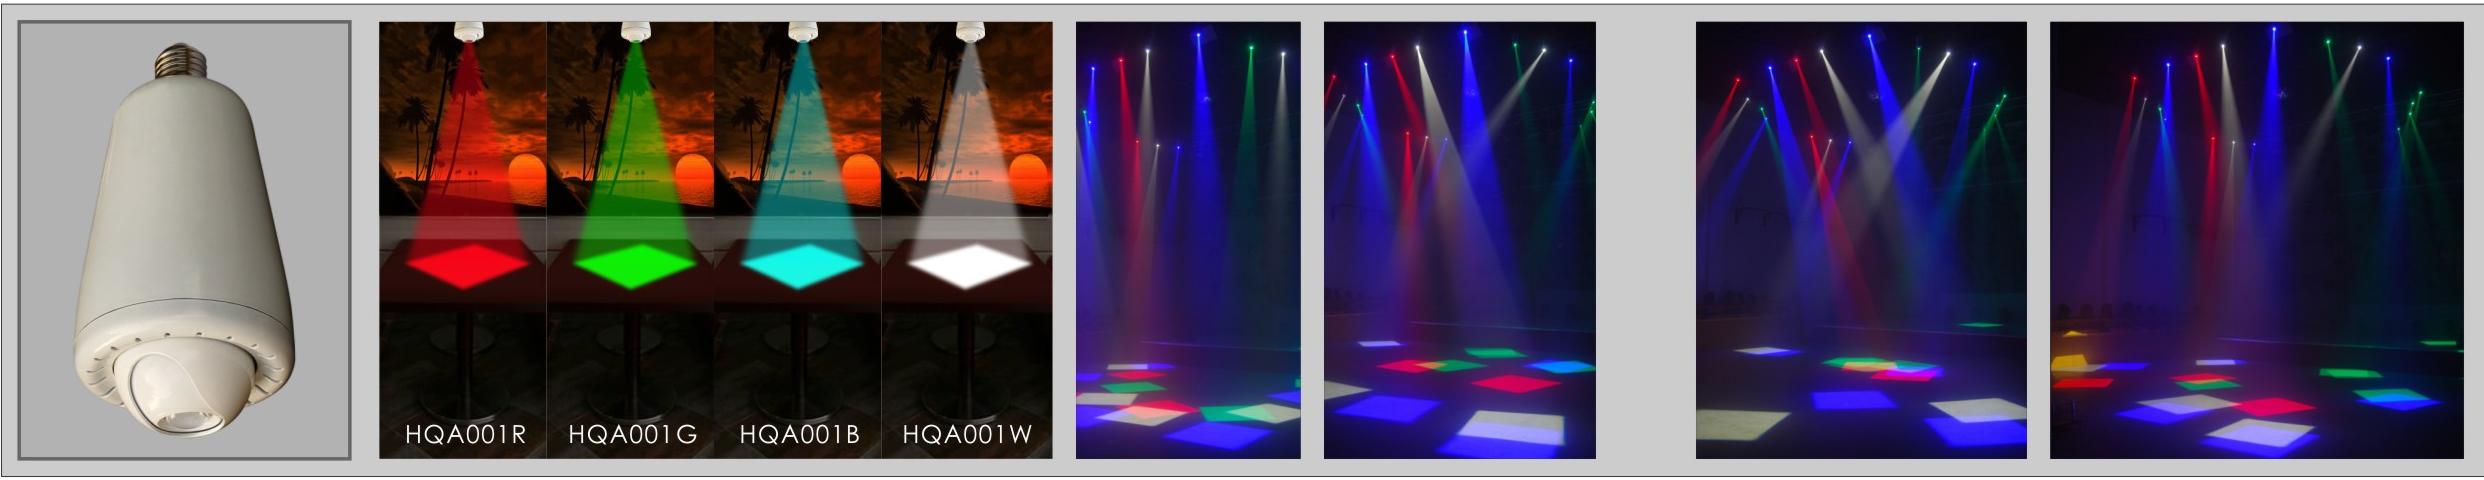 fotismos_led_moving_square_head_beam_gia_nyxterina_kentra_club_bar